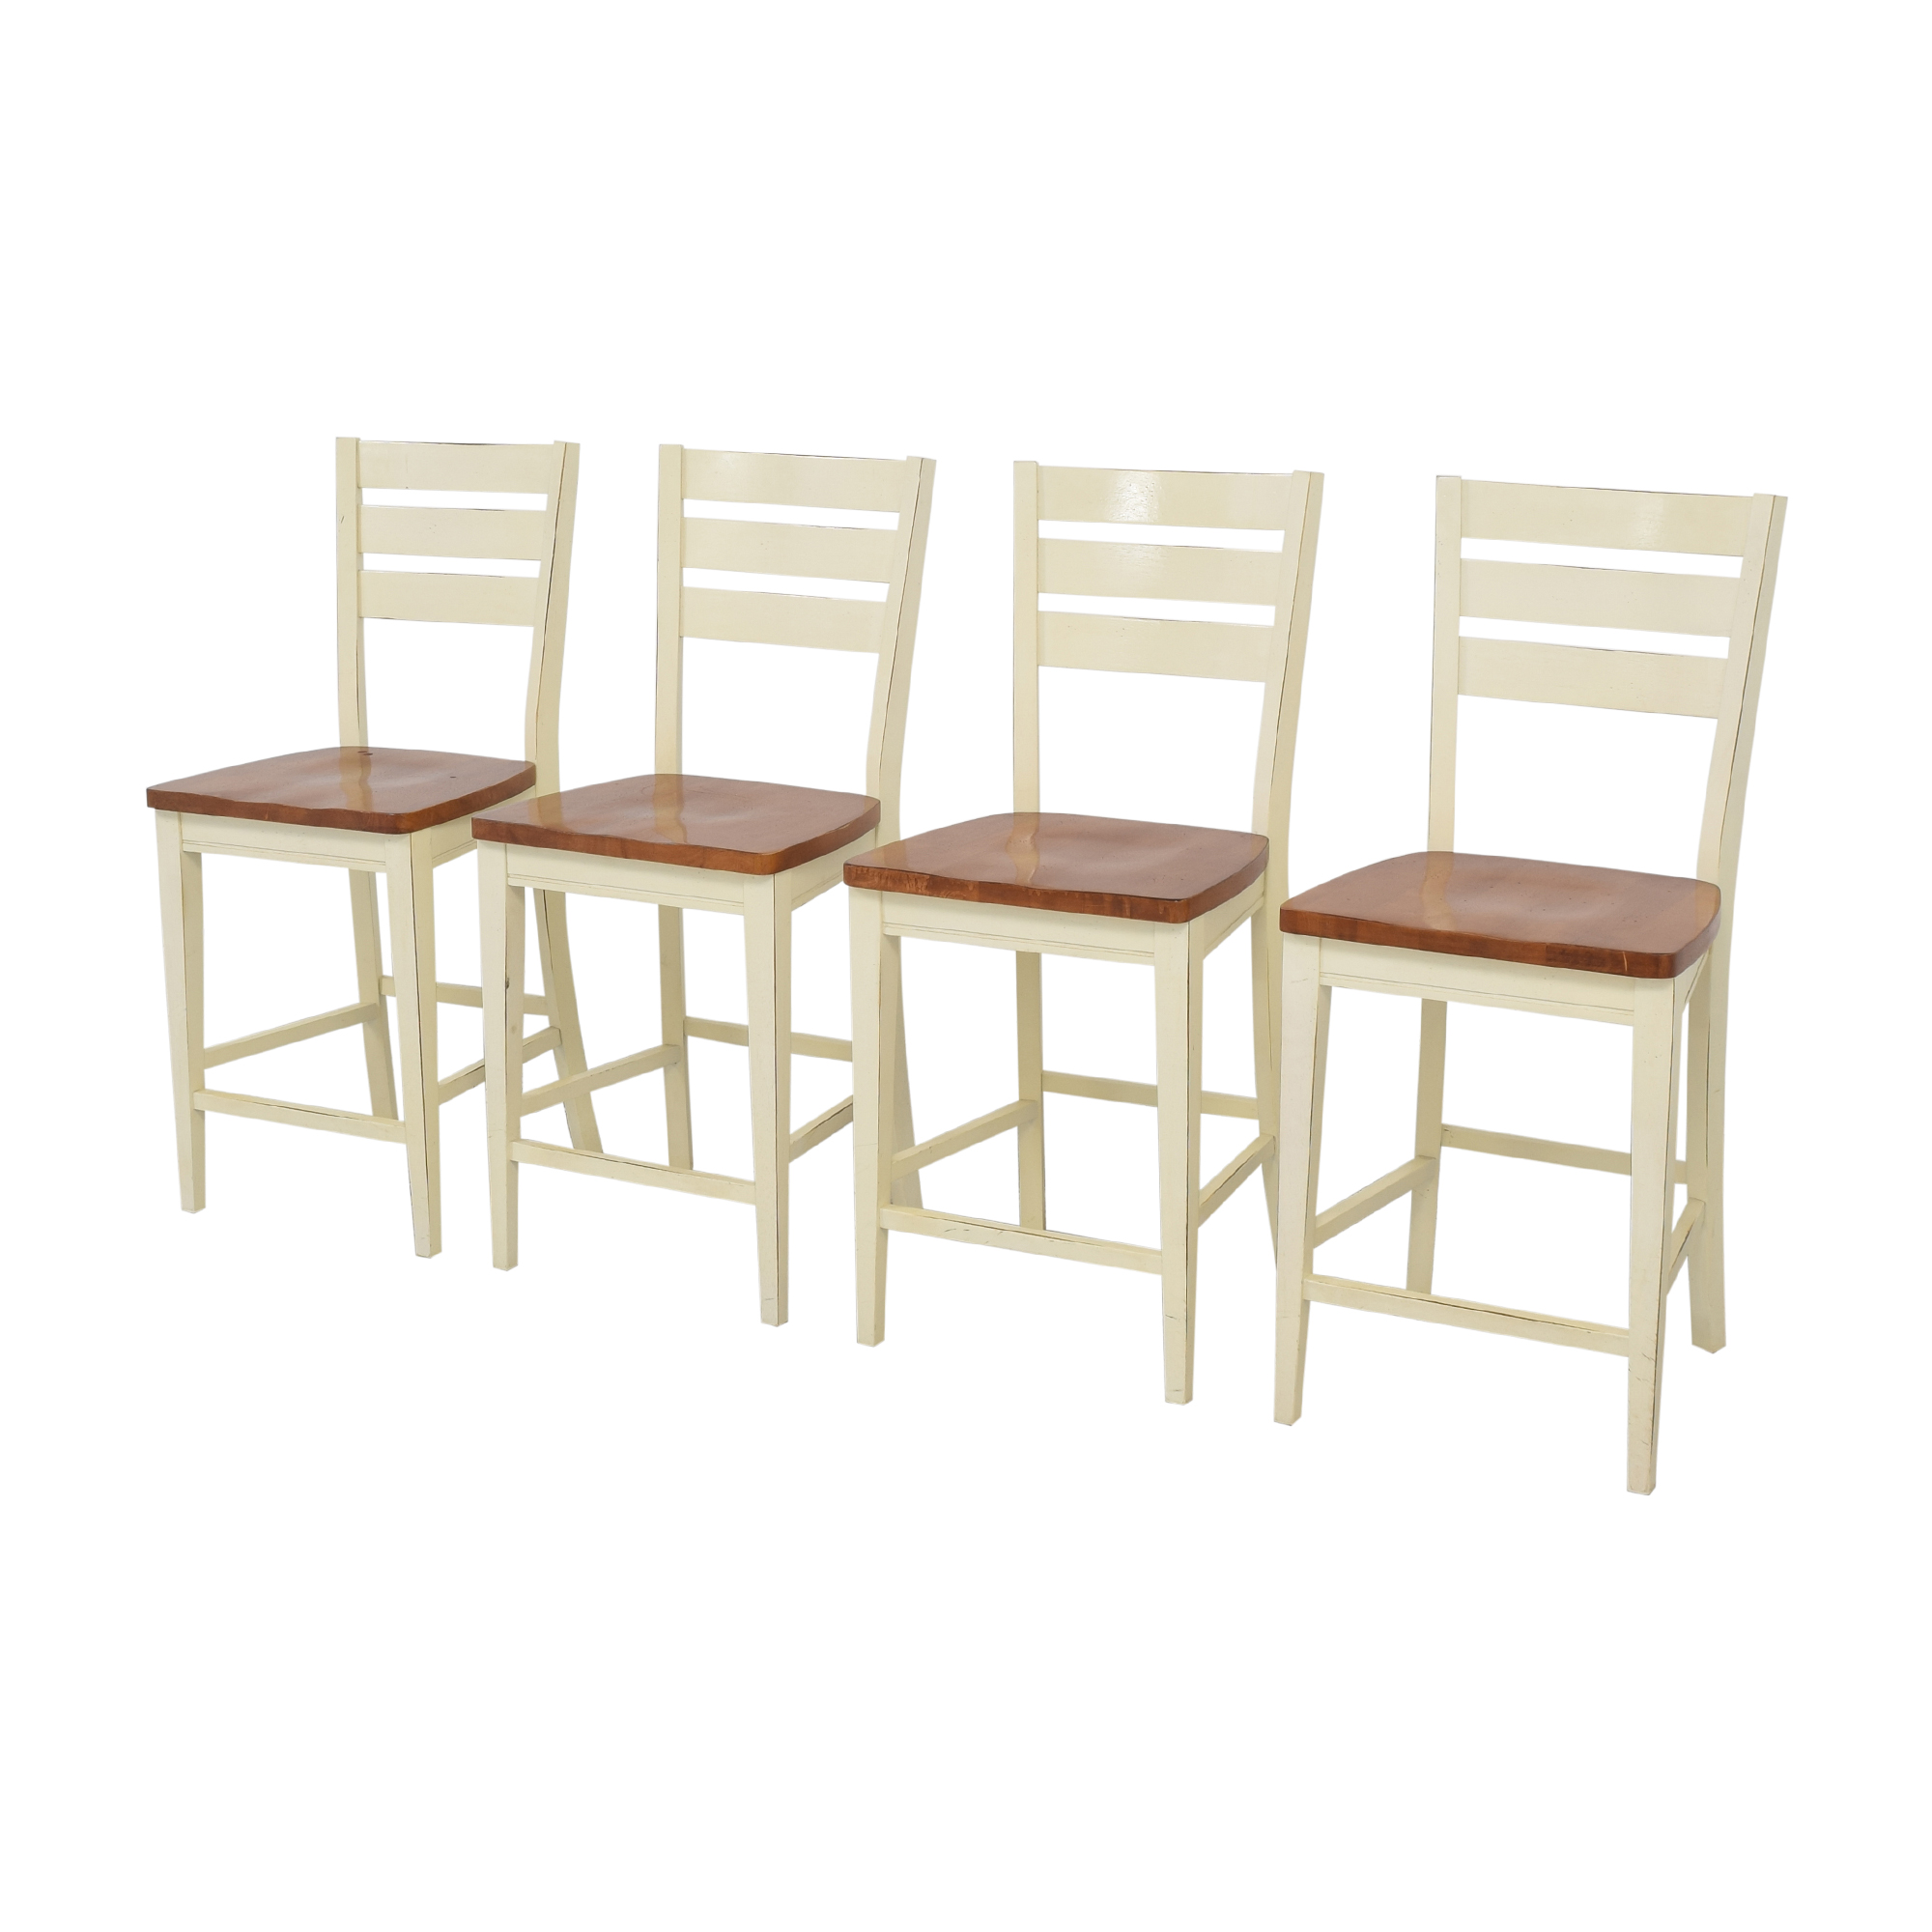 buy Bassett Dining Stools Bassett Furniture